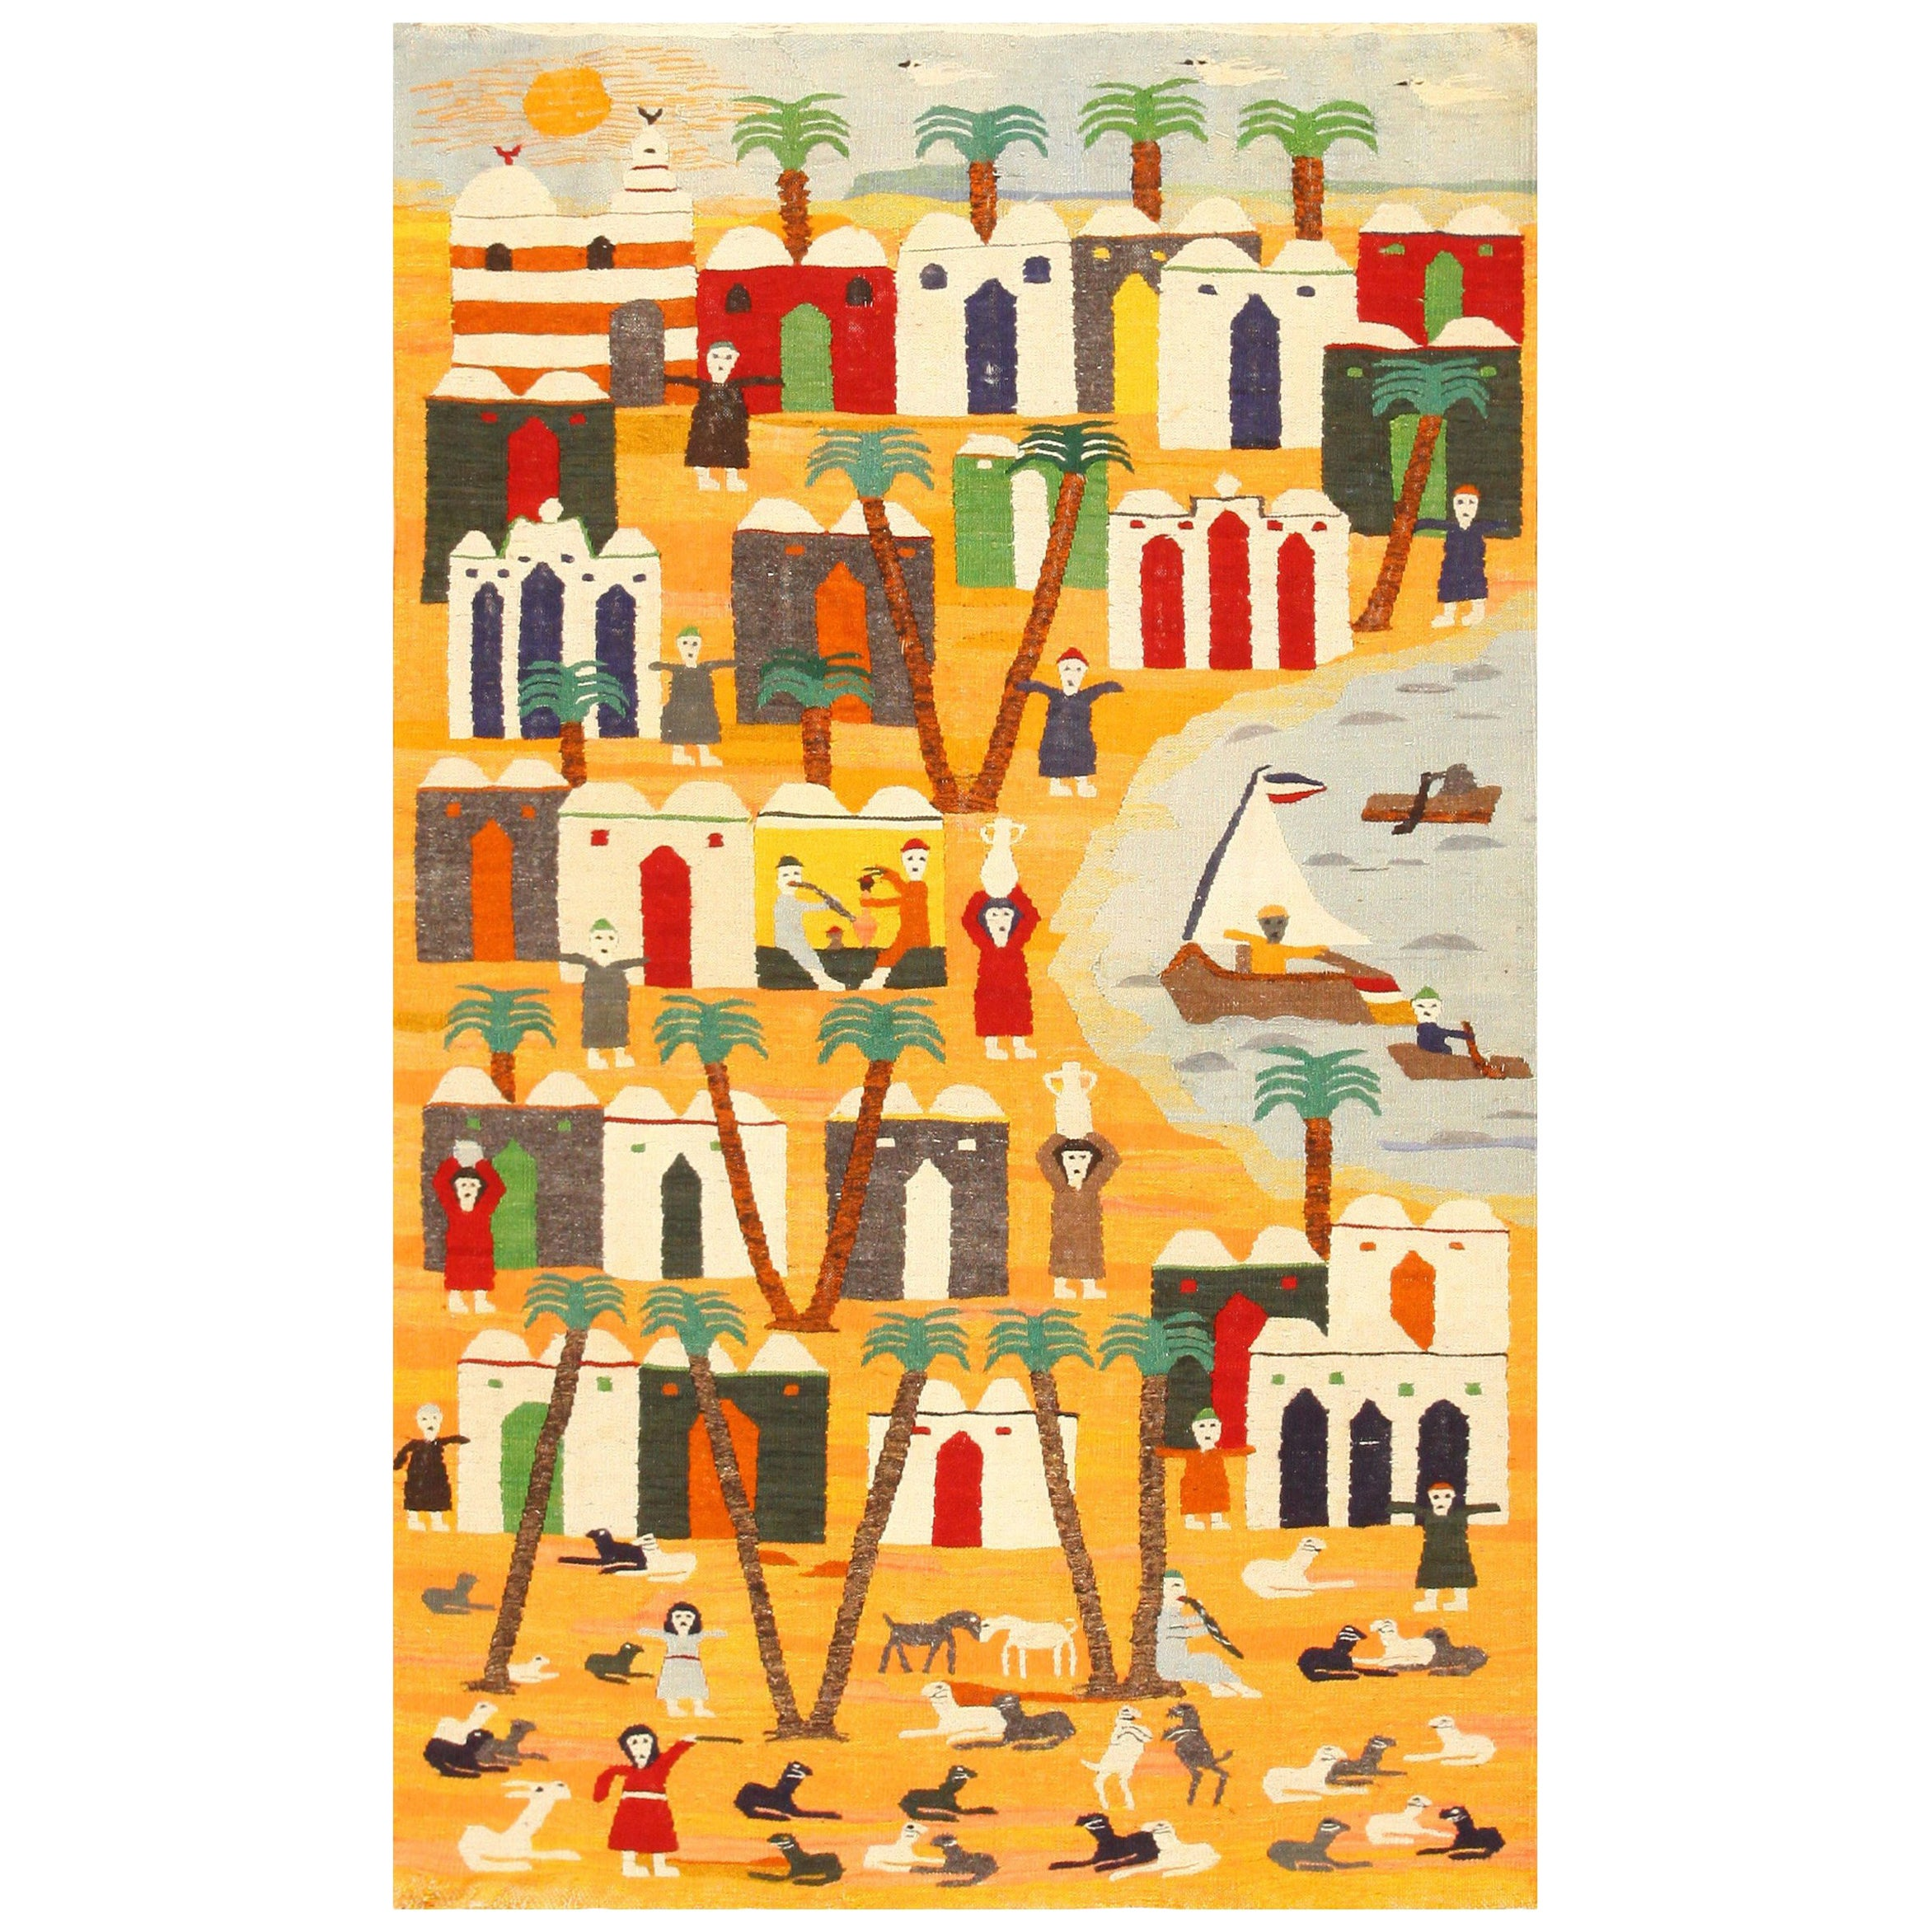 Vintage Swedish Folk Art Tapestry. Size: 4 ft 2 in x 6 ft 7 in (1.27 m x 2.01 m)